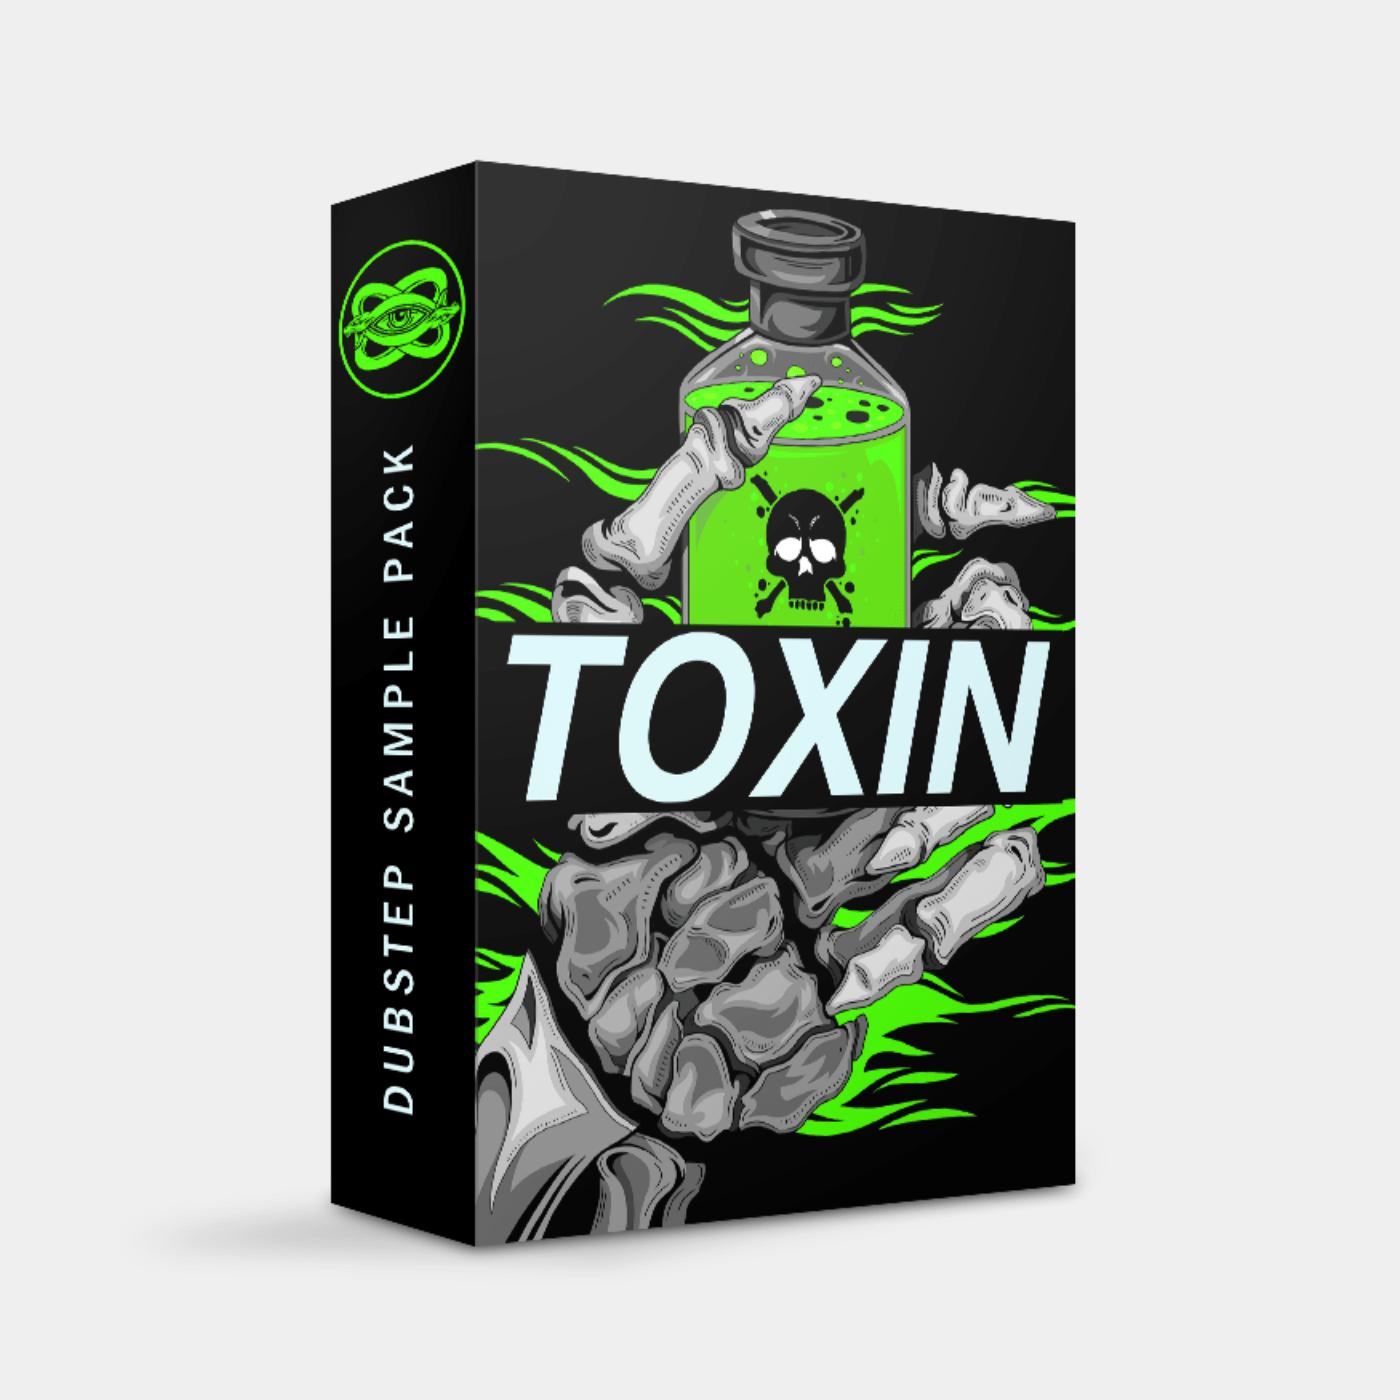 Toxin Dubstep Sample Pack